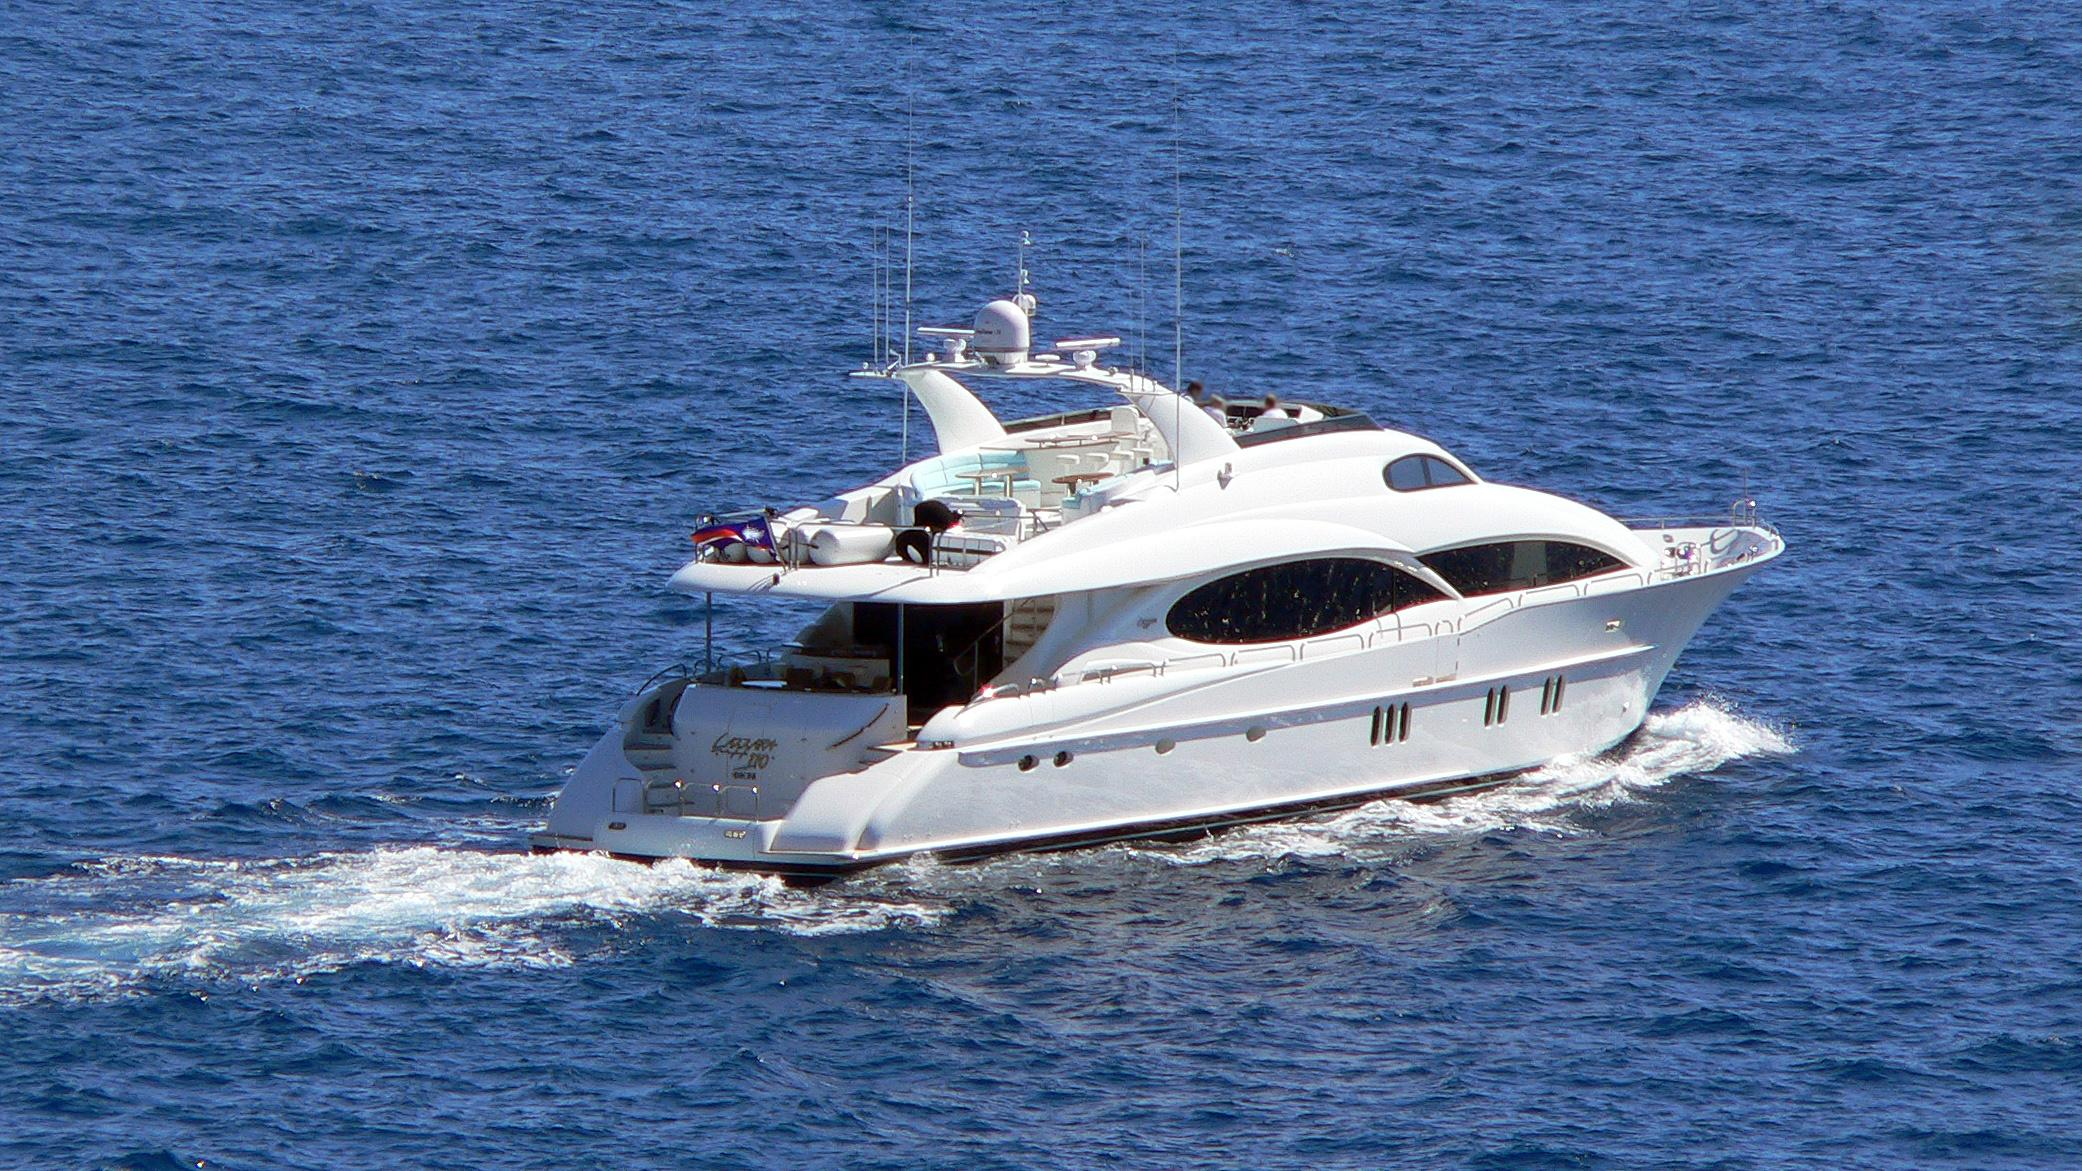 le-reve-motor-yacht-lazzara-110-sl-2006-33m-cruising-stern